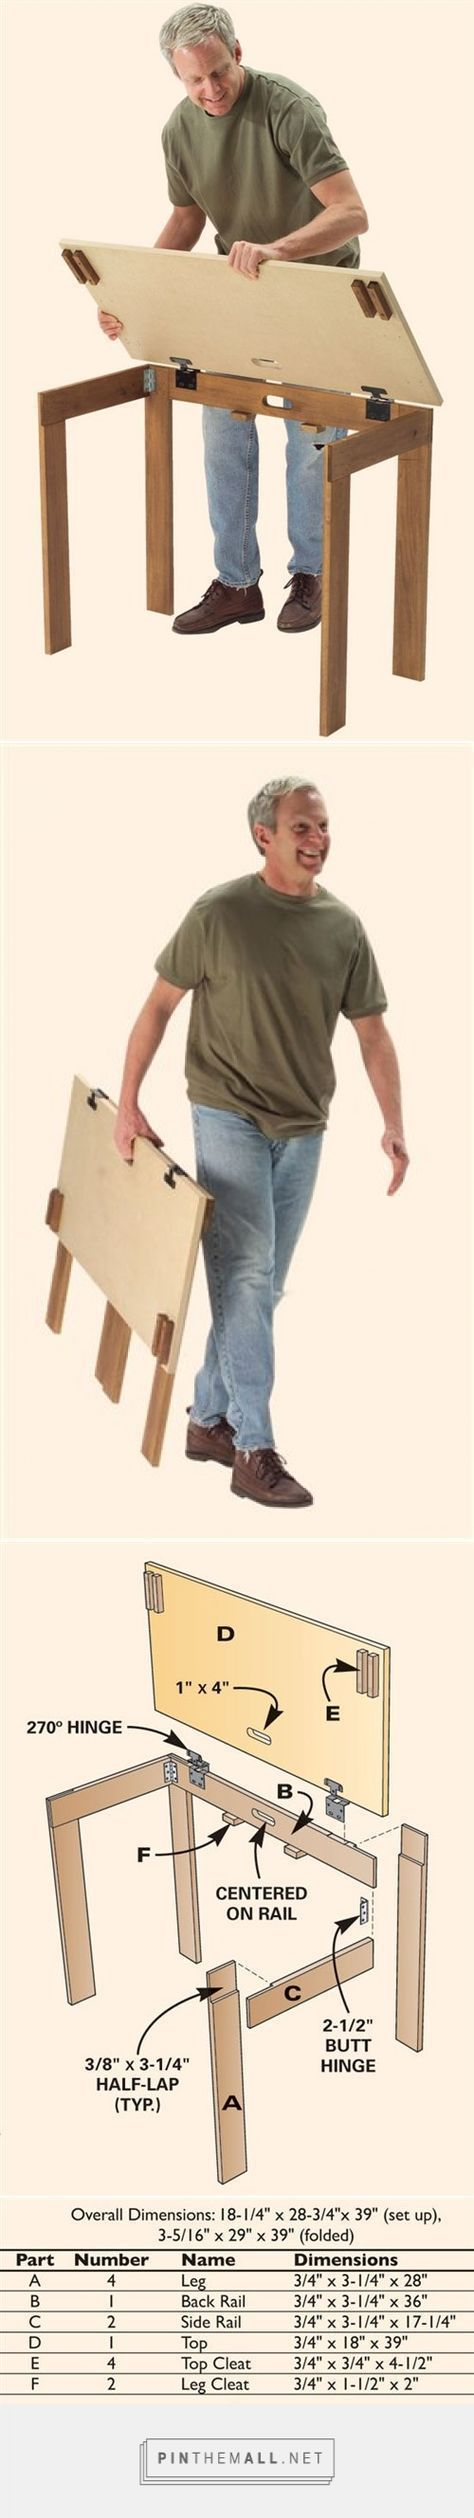 53 best Cardboard Chair Inspo images on Pinterest | Cardboard ...